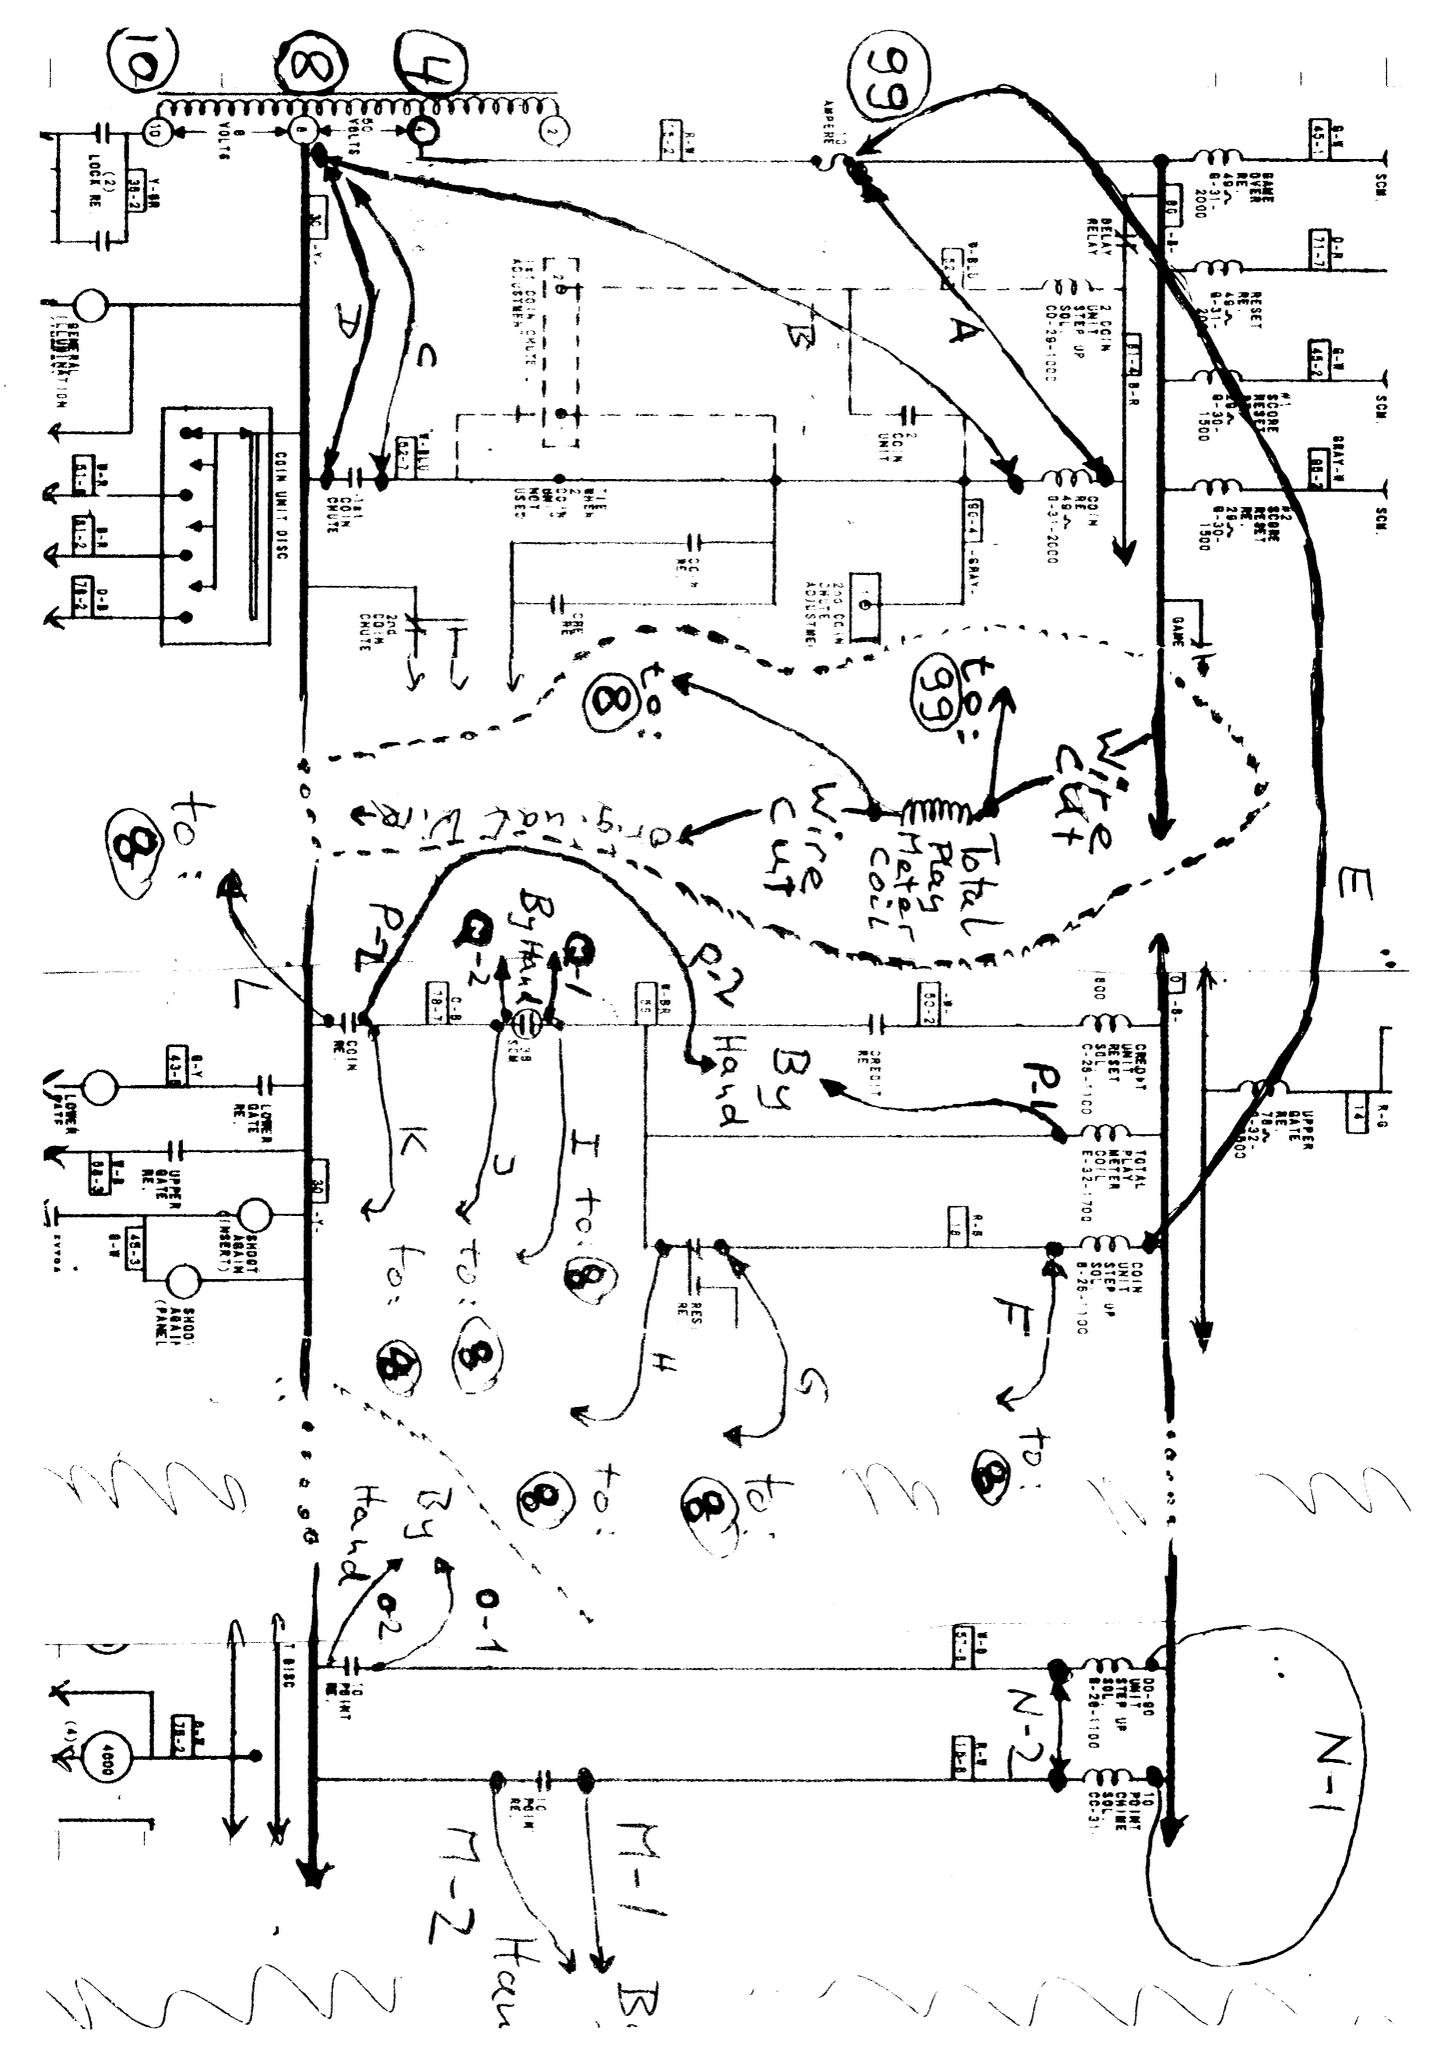 using schematics and 8 foot jumper wires